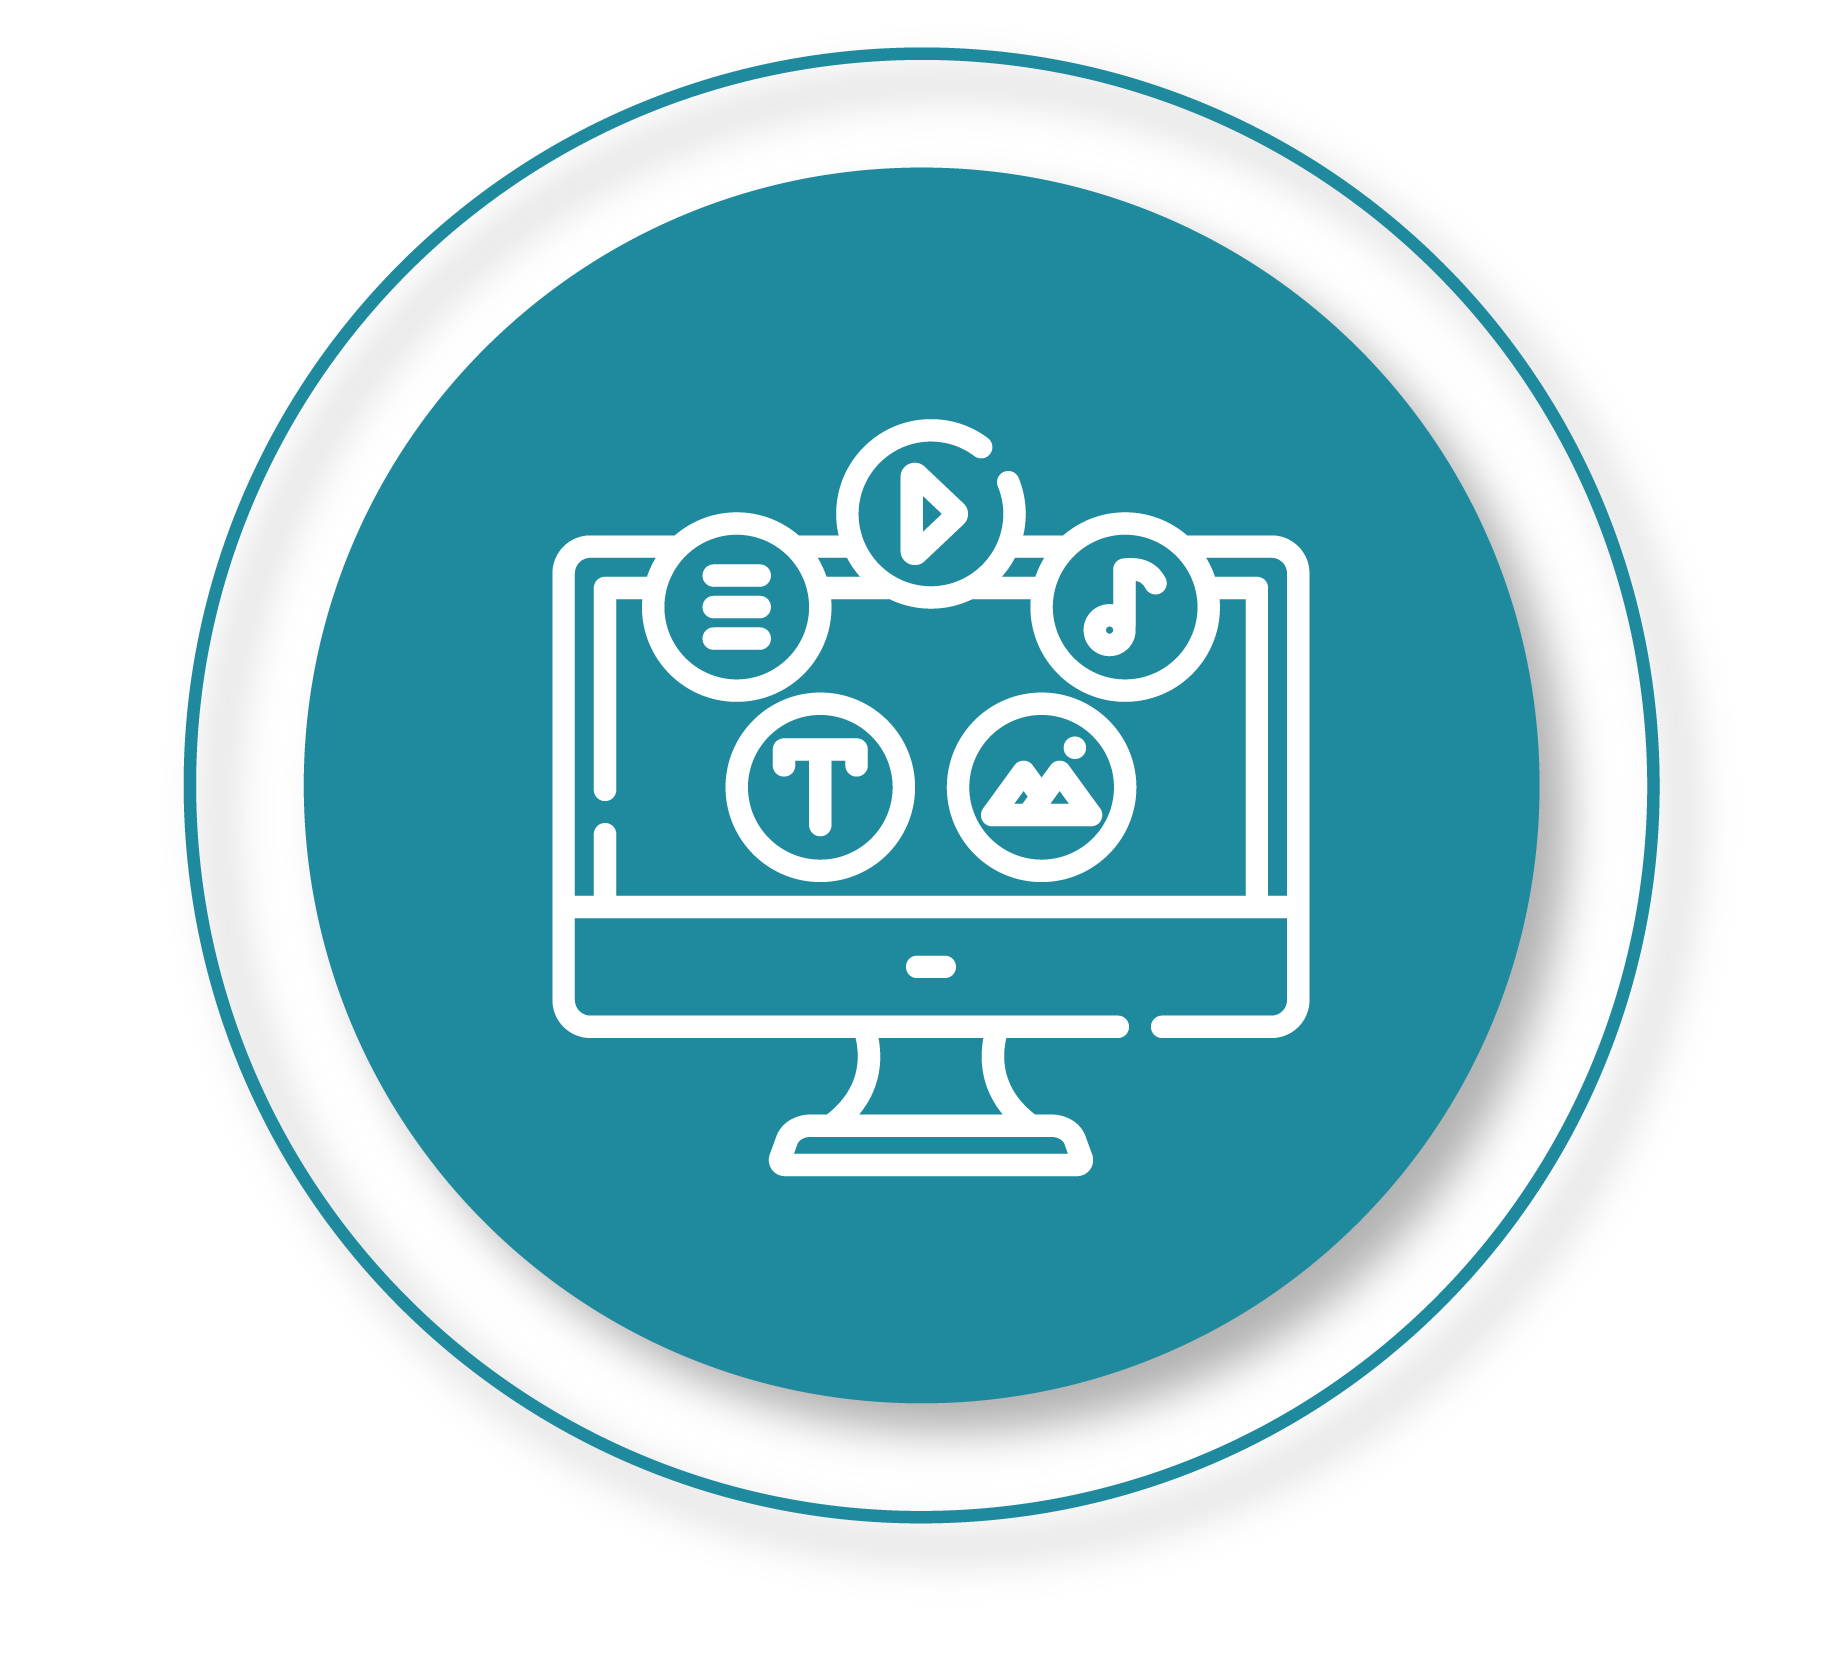 desktop screen icon